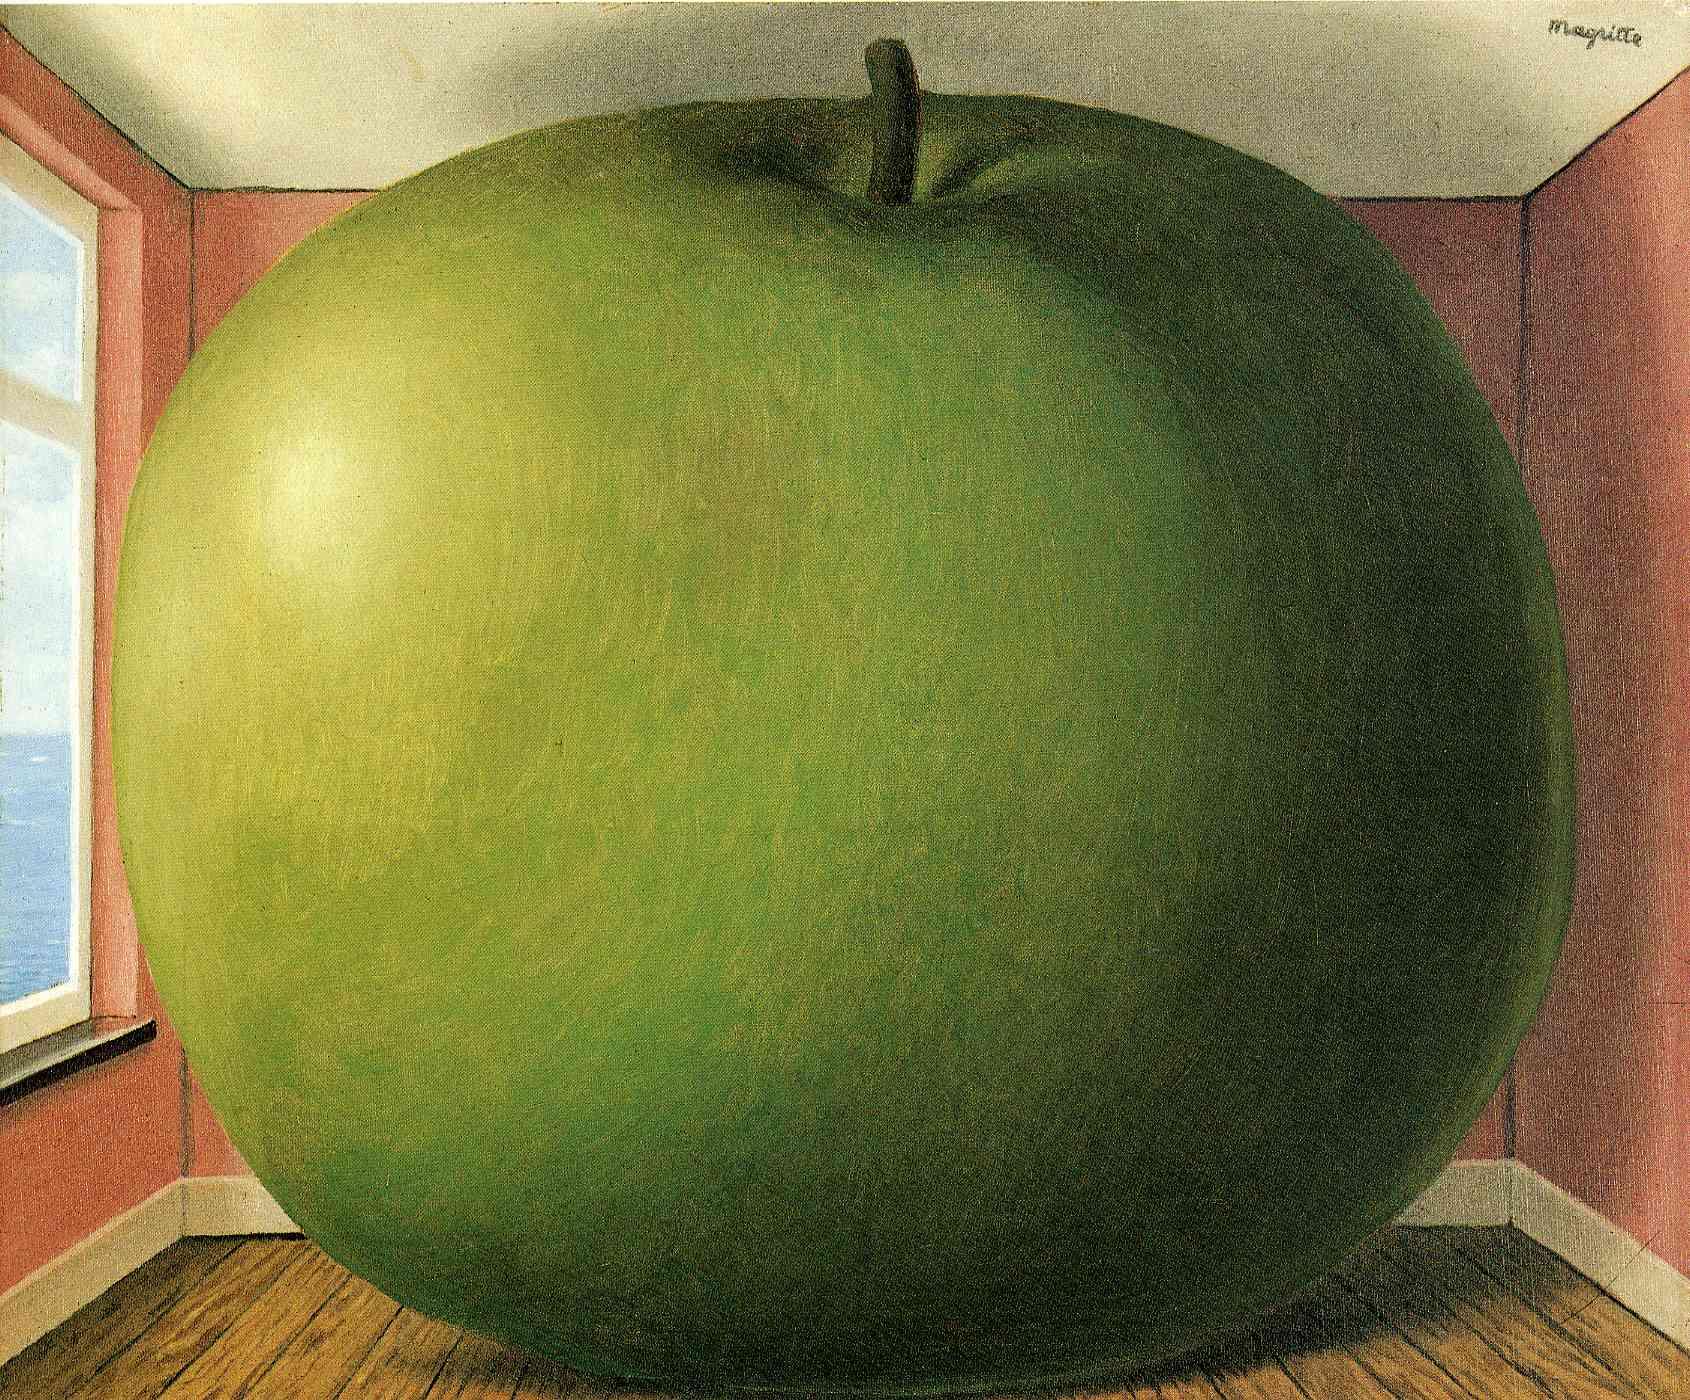 René Magritte Apfel